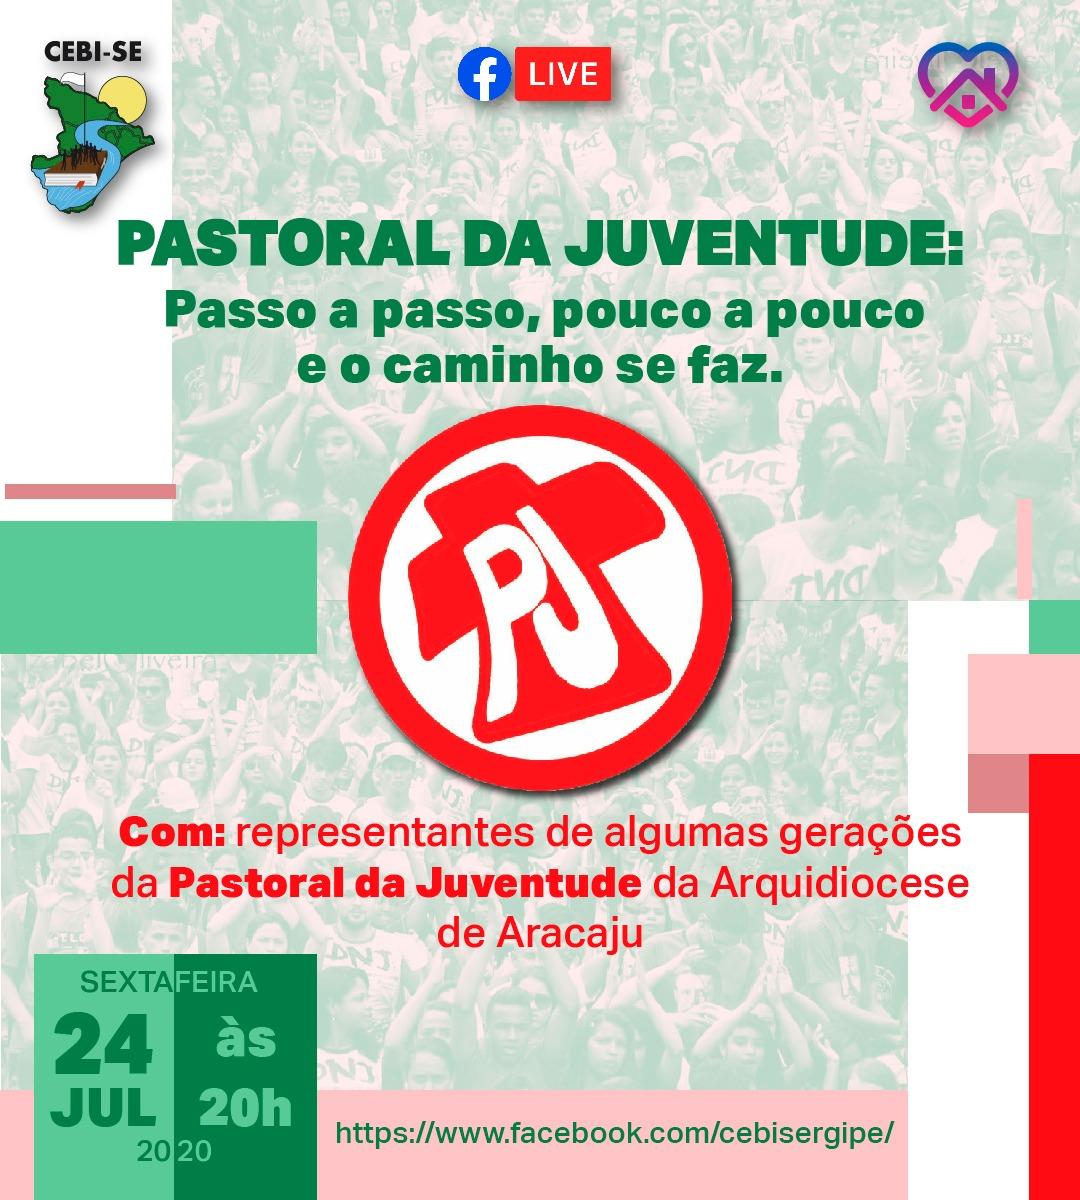 CEBI Sergipe debaterá em live a Pastoral da Juventude